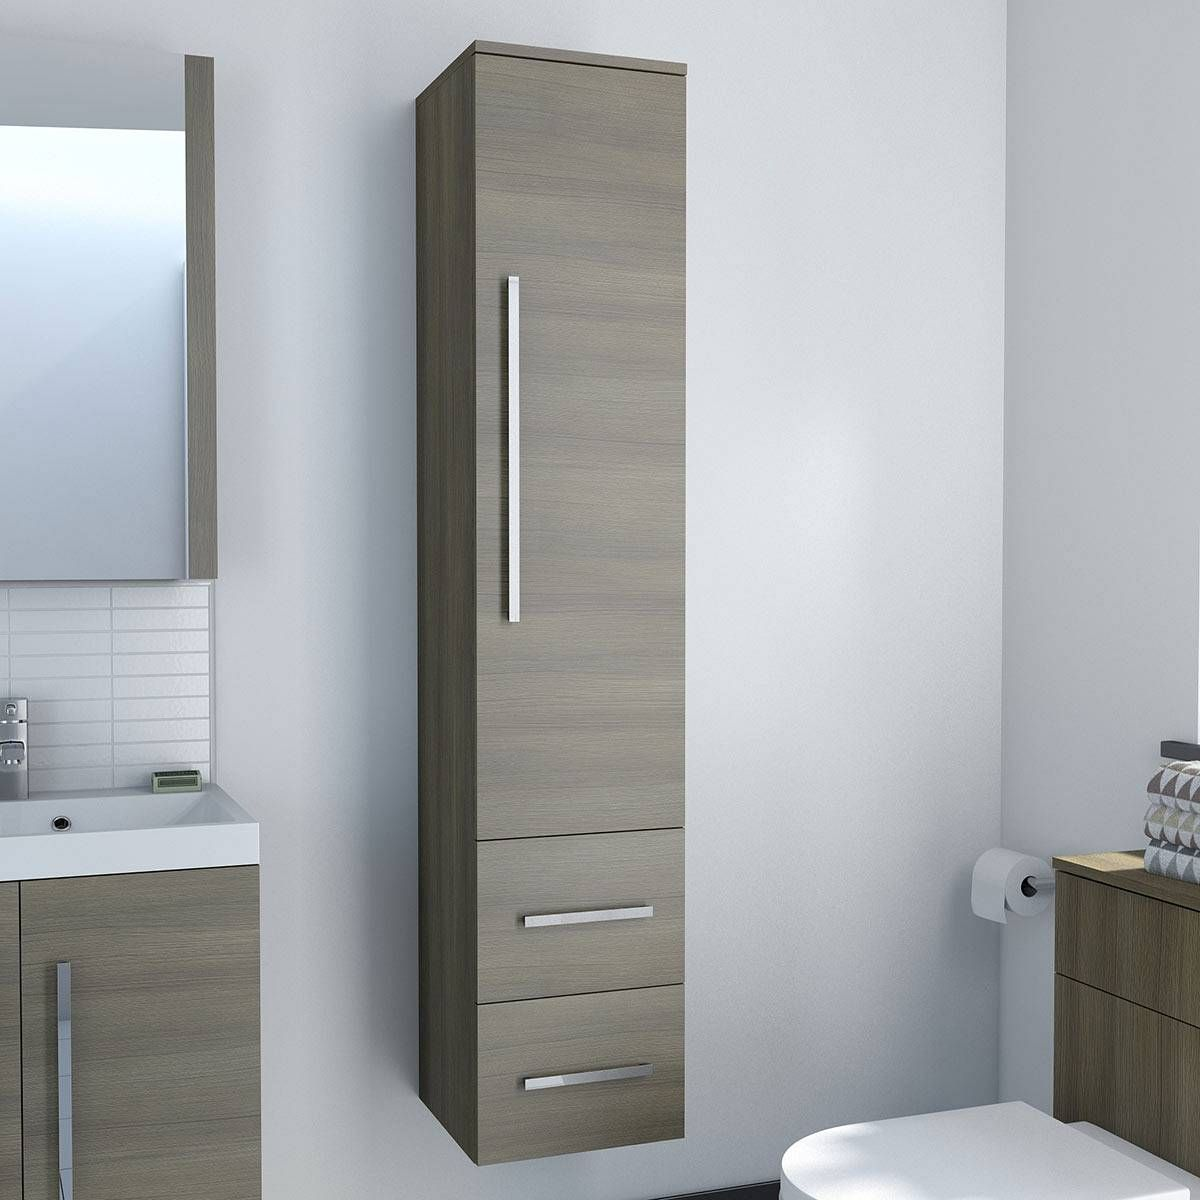 Narrow Tall Bathroom Cabinets  home decor  Bathroom